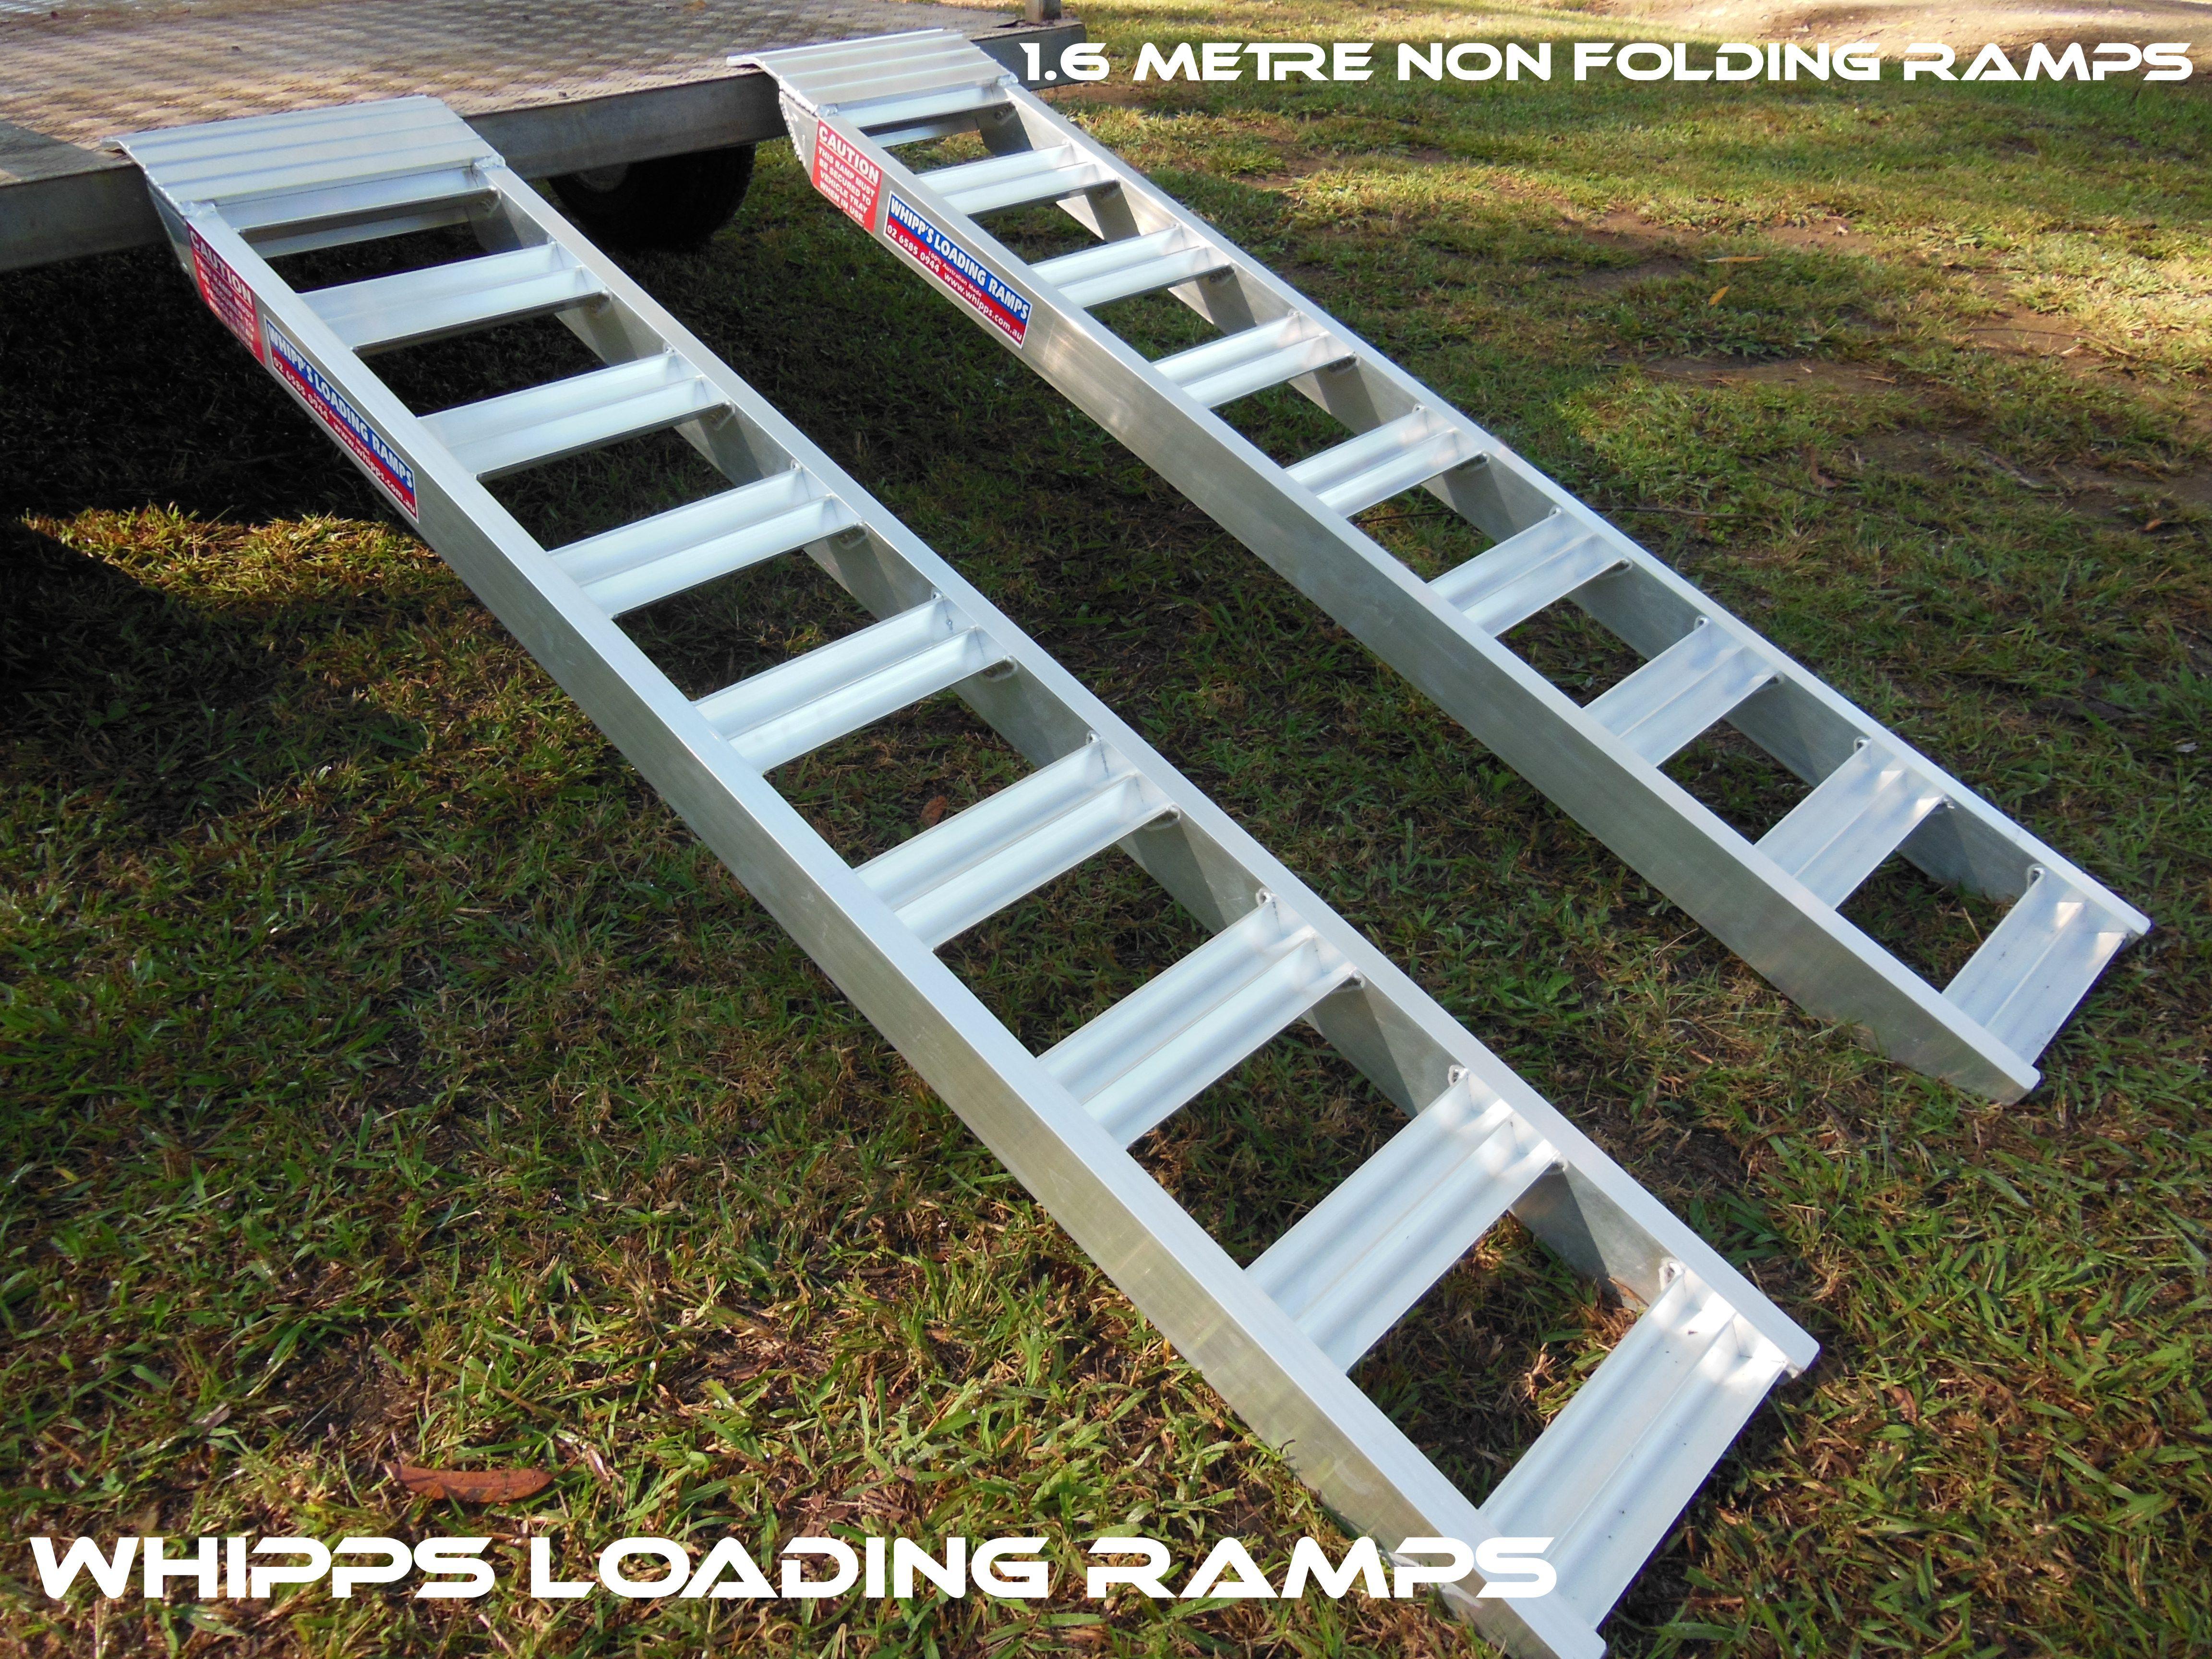 1.6 metre aluminium atv ramps